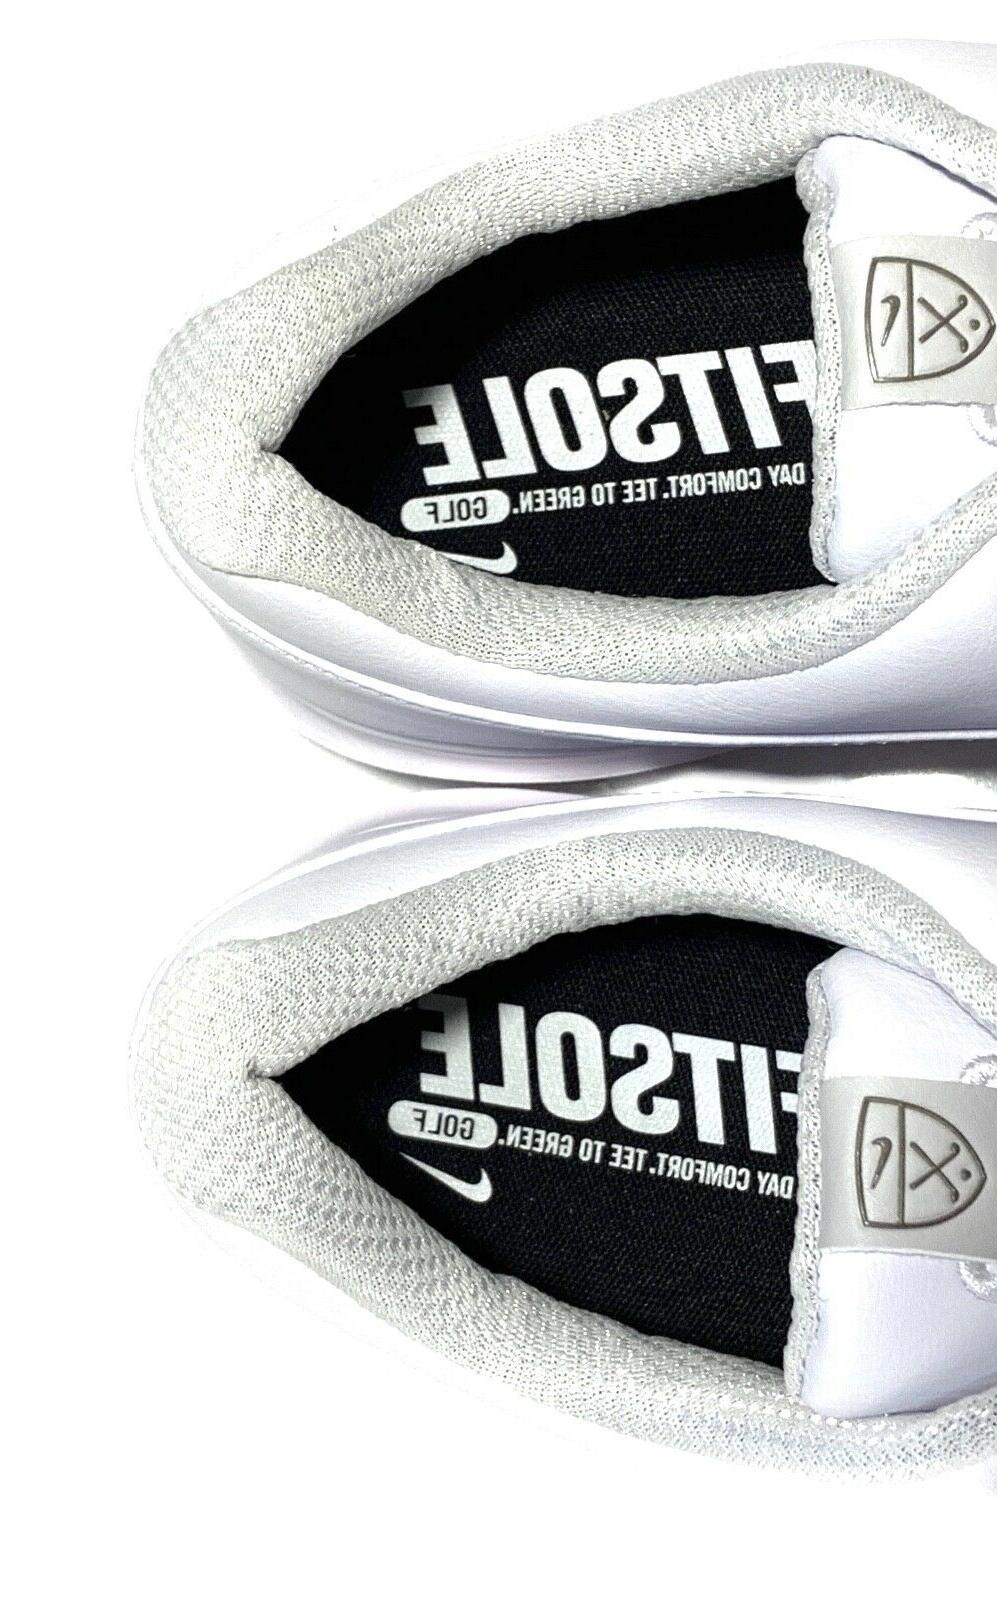 Nike Air Pro Shoes White Men's